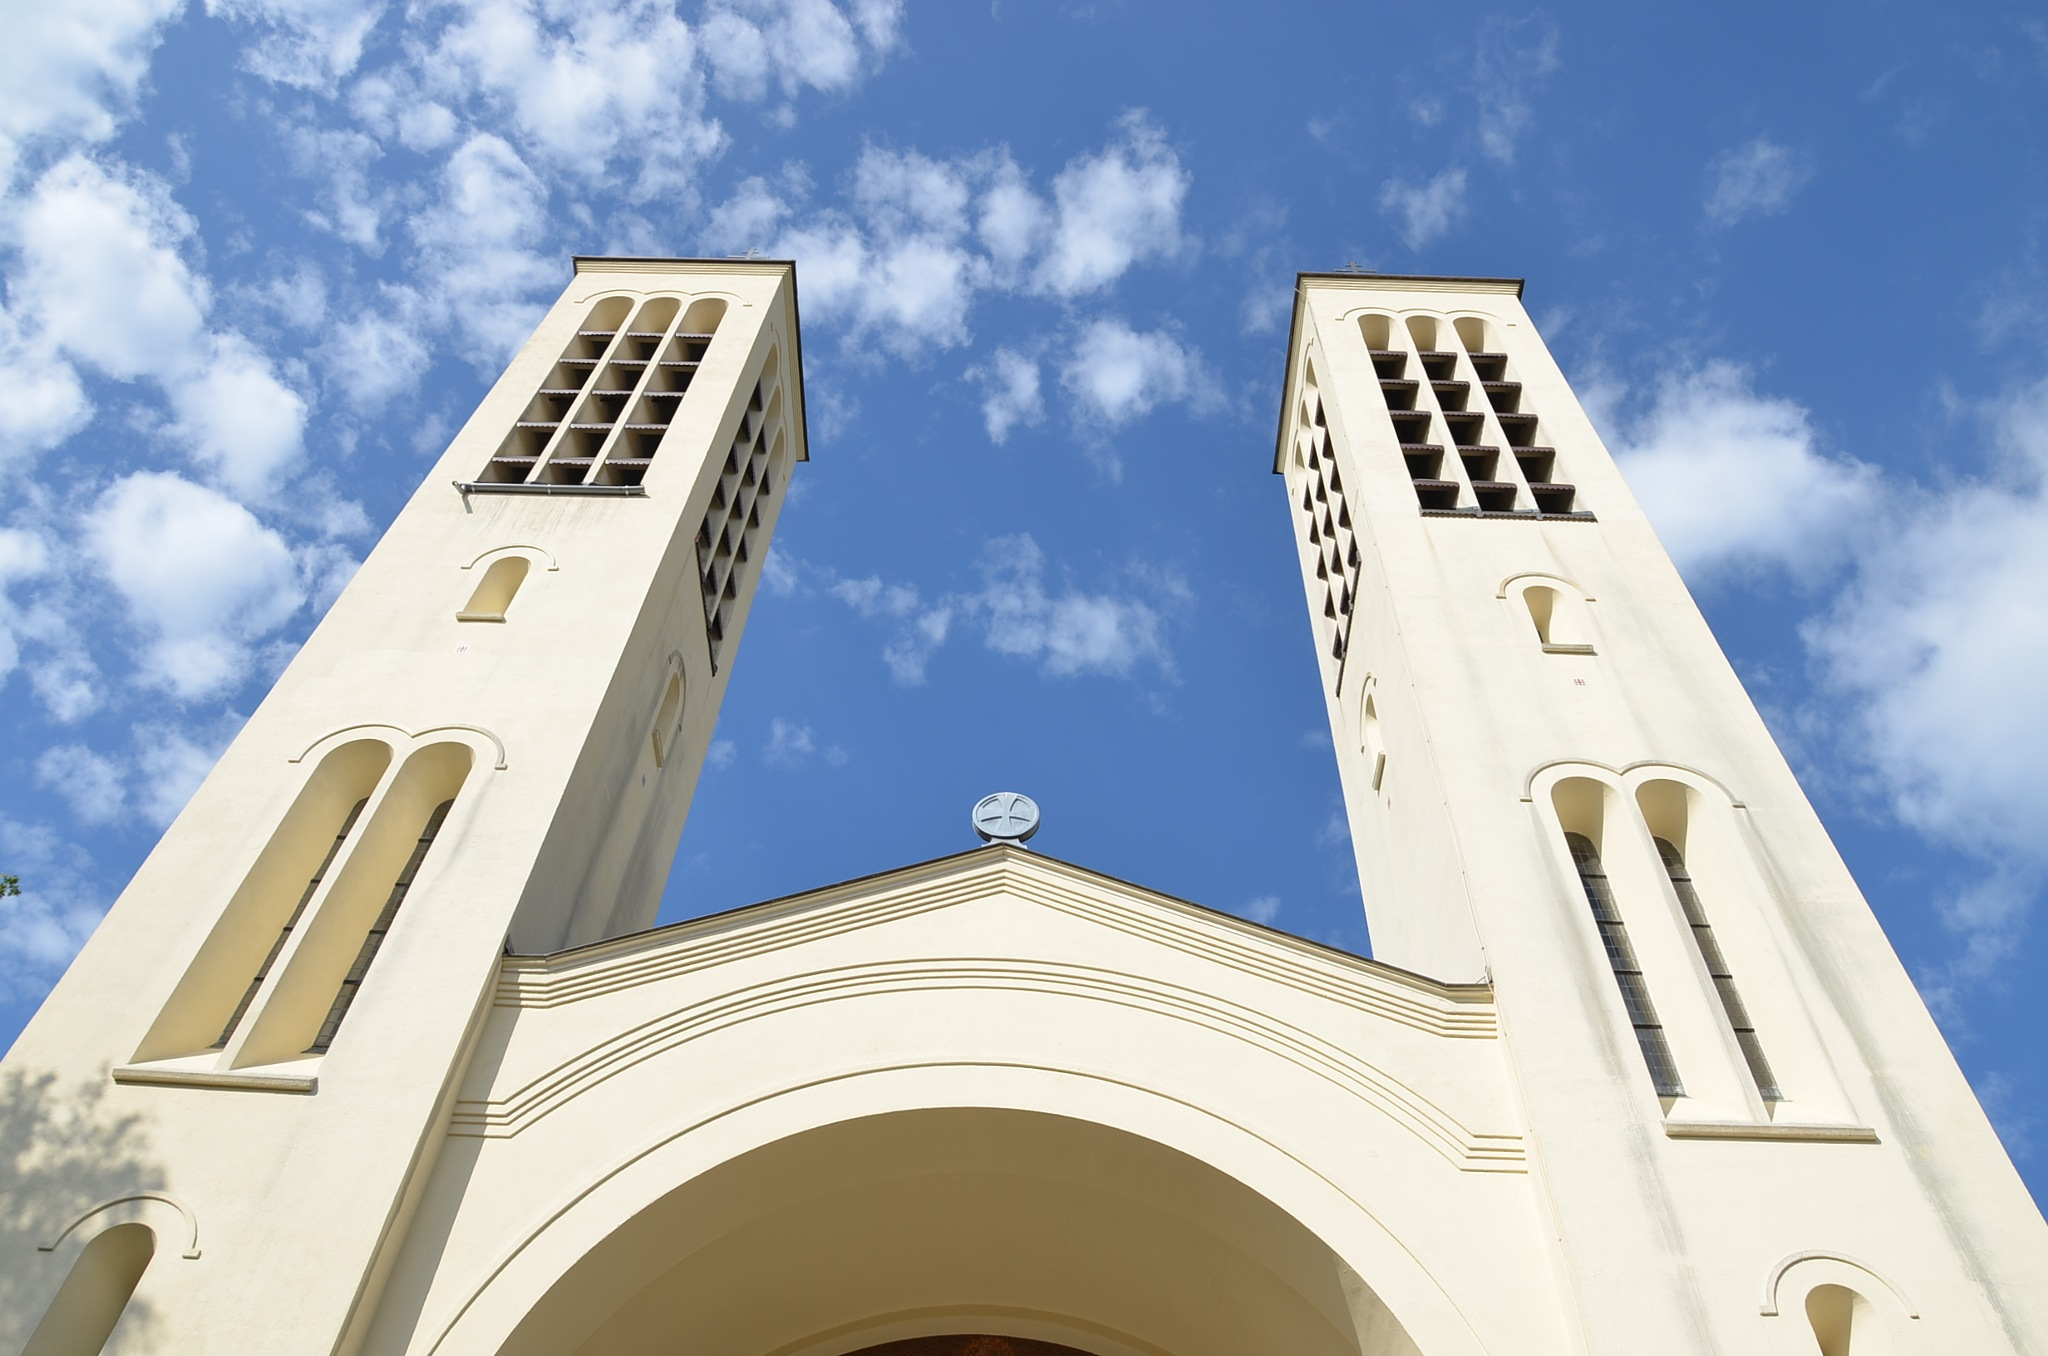 Towers Cenakel church by Edwin de Vos